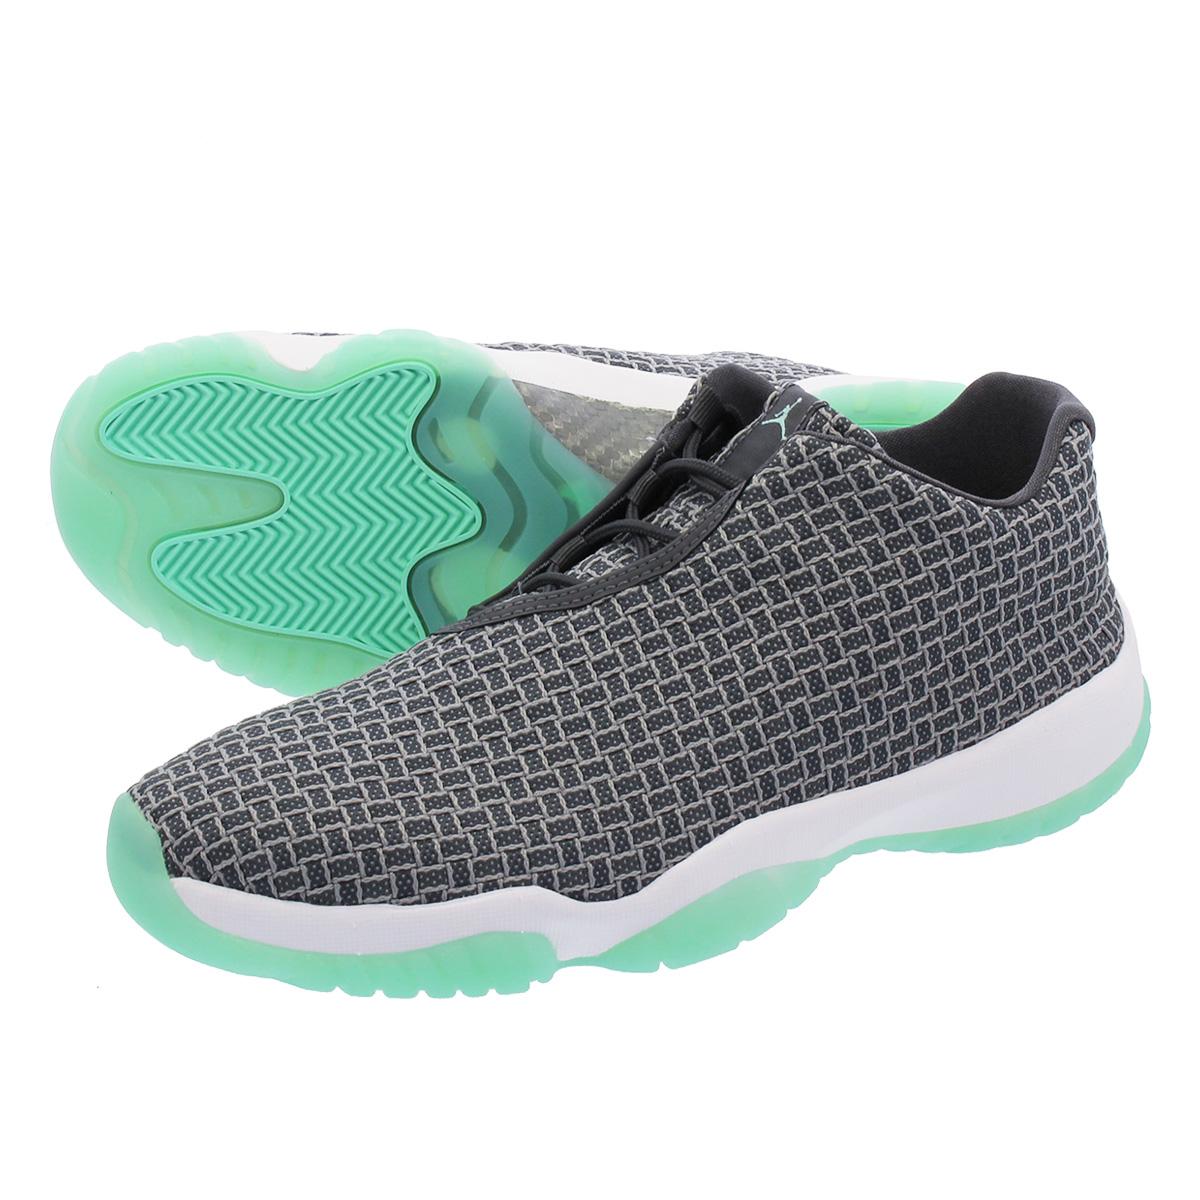 5ec22f80c197 LOWTEX PLUS  NIKE AIR JORDAN FUTURE LOW Nike Air Jordan future low WOLF GREY  EMERALD RISE WHITE 718